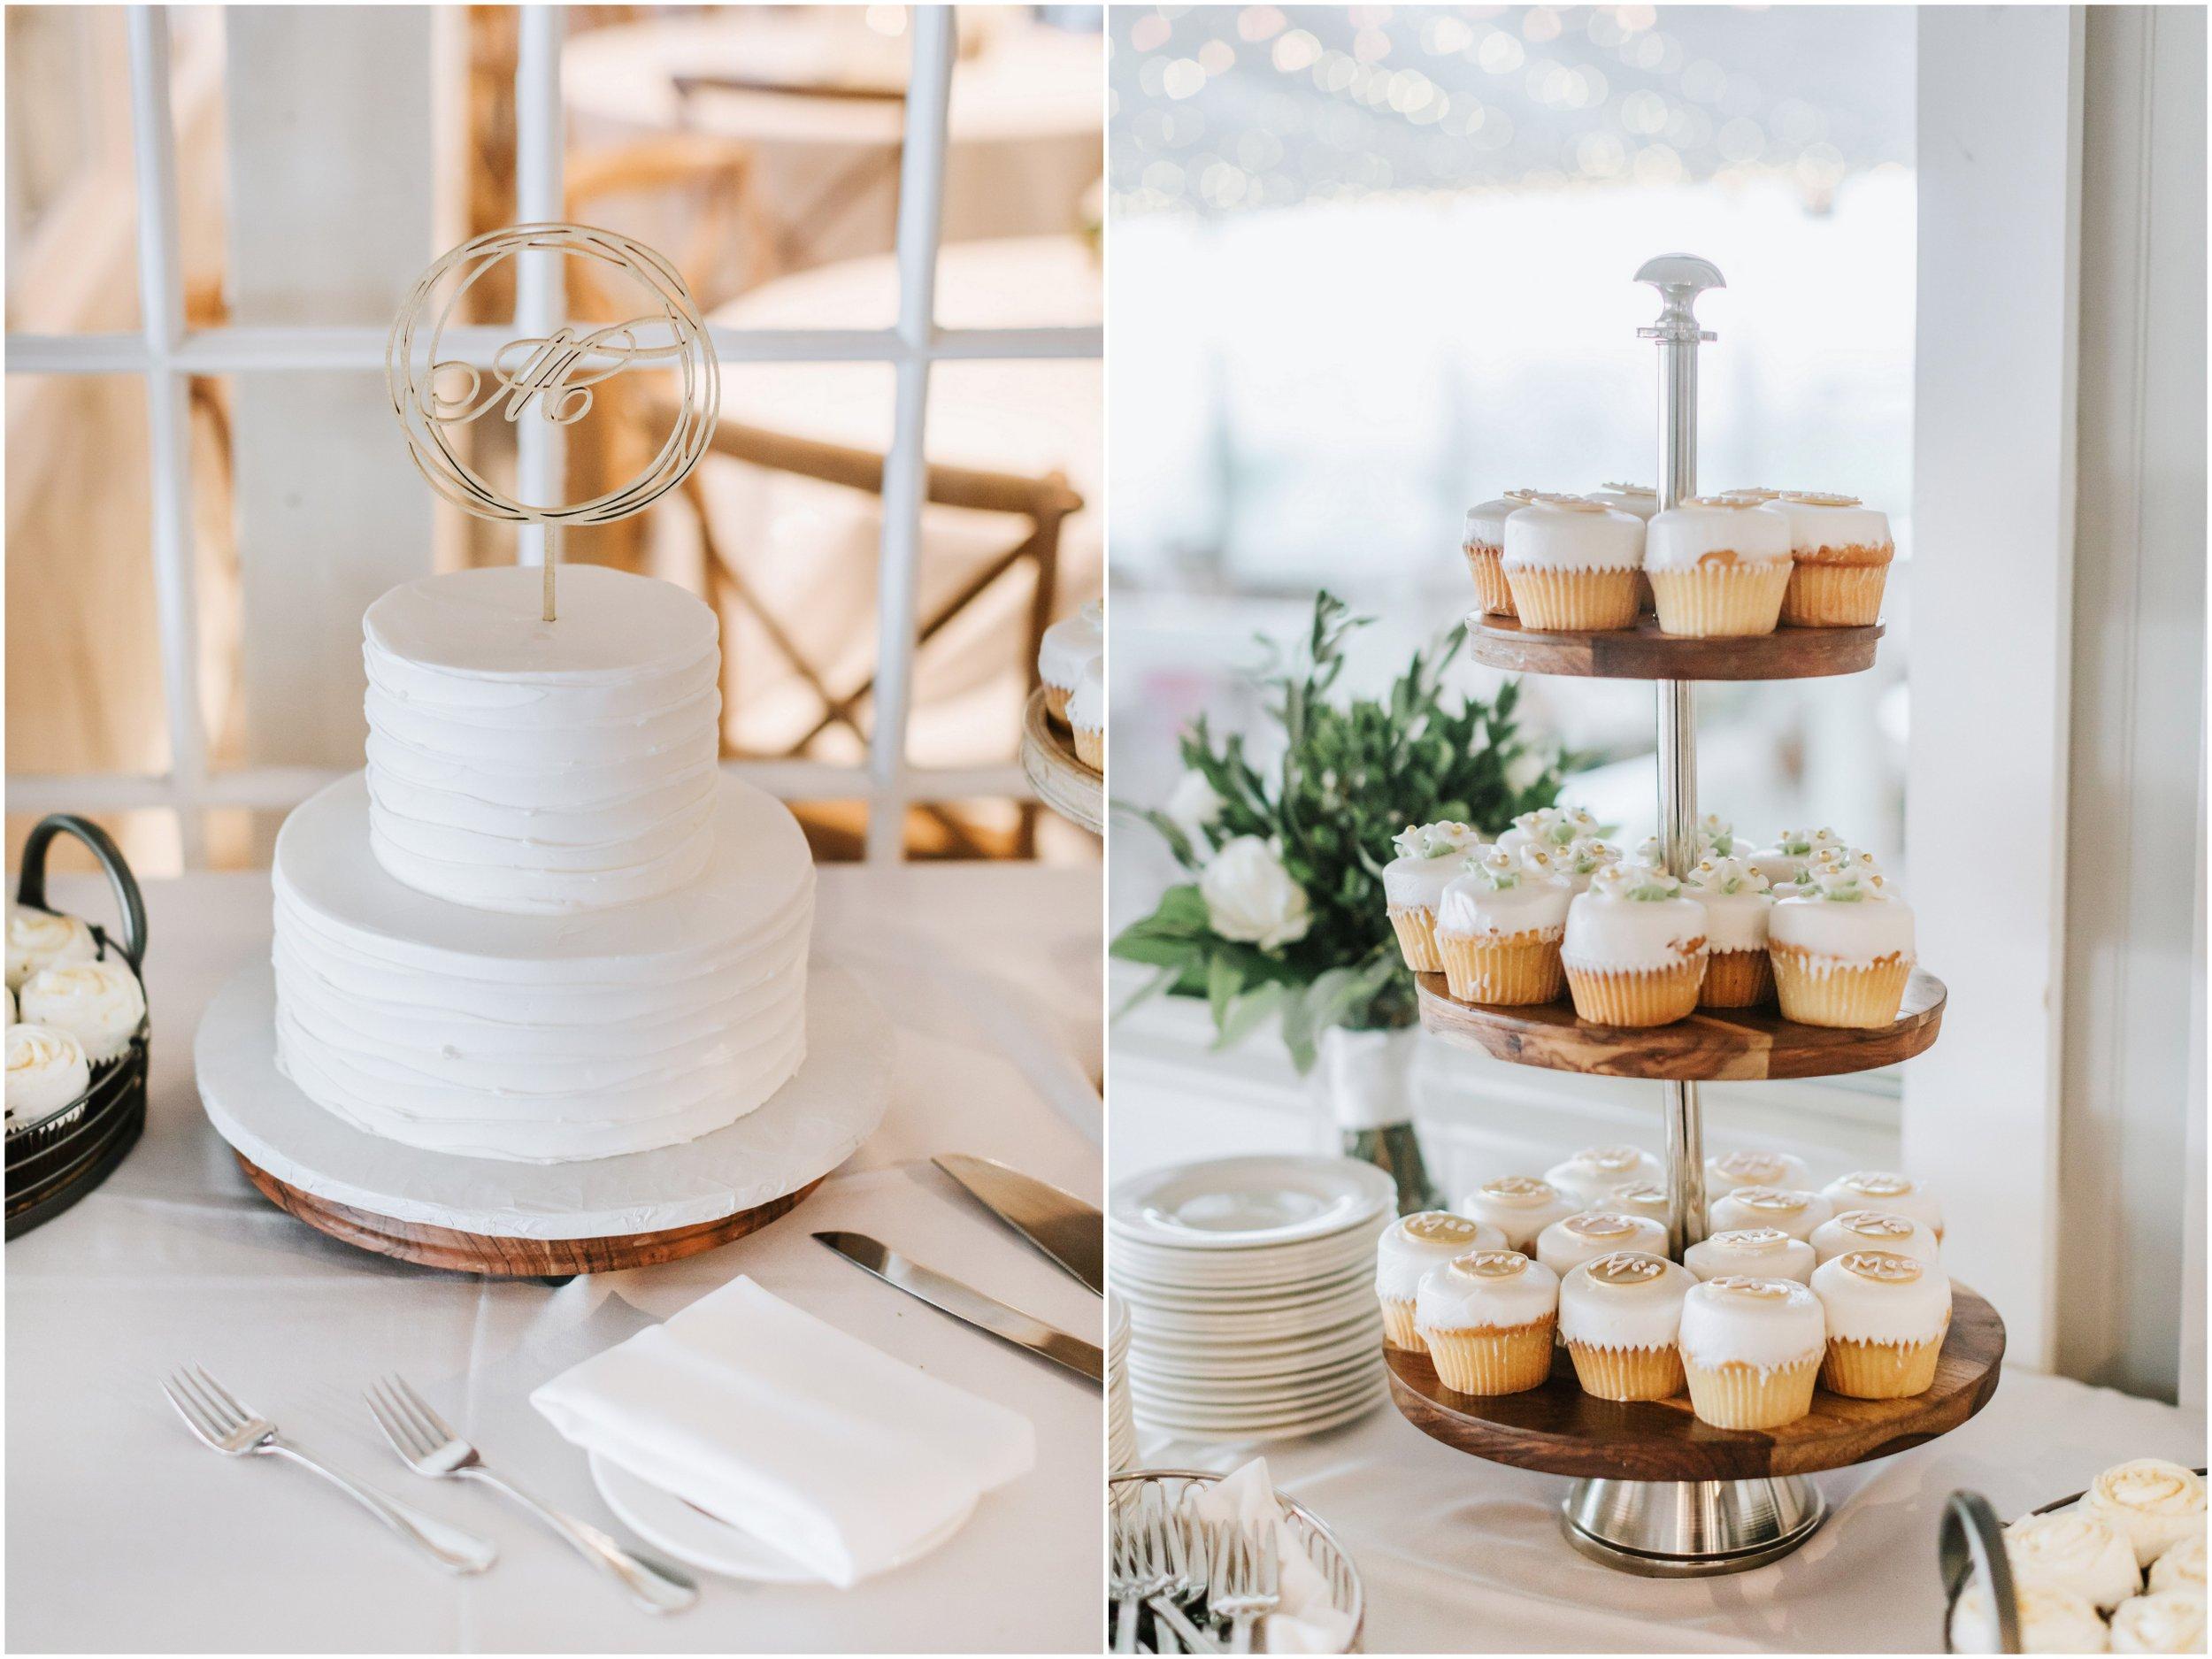 Popponesset-Inn-Wedding-Cape-Cod-Lena-Mirisola-Photography-45.jpg